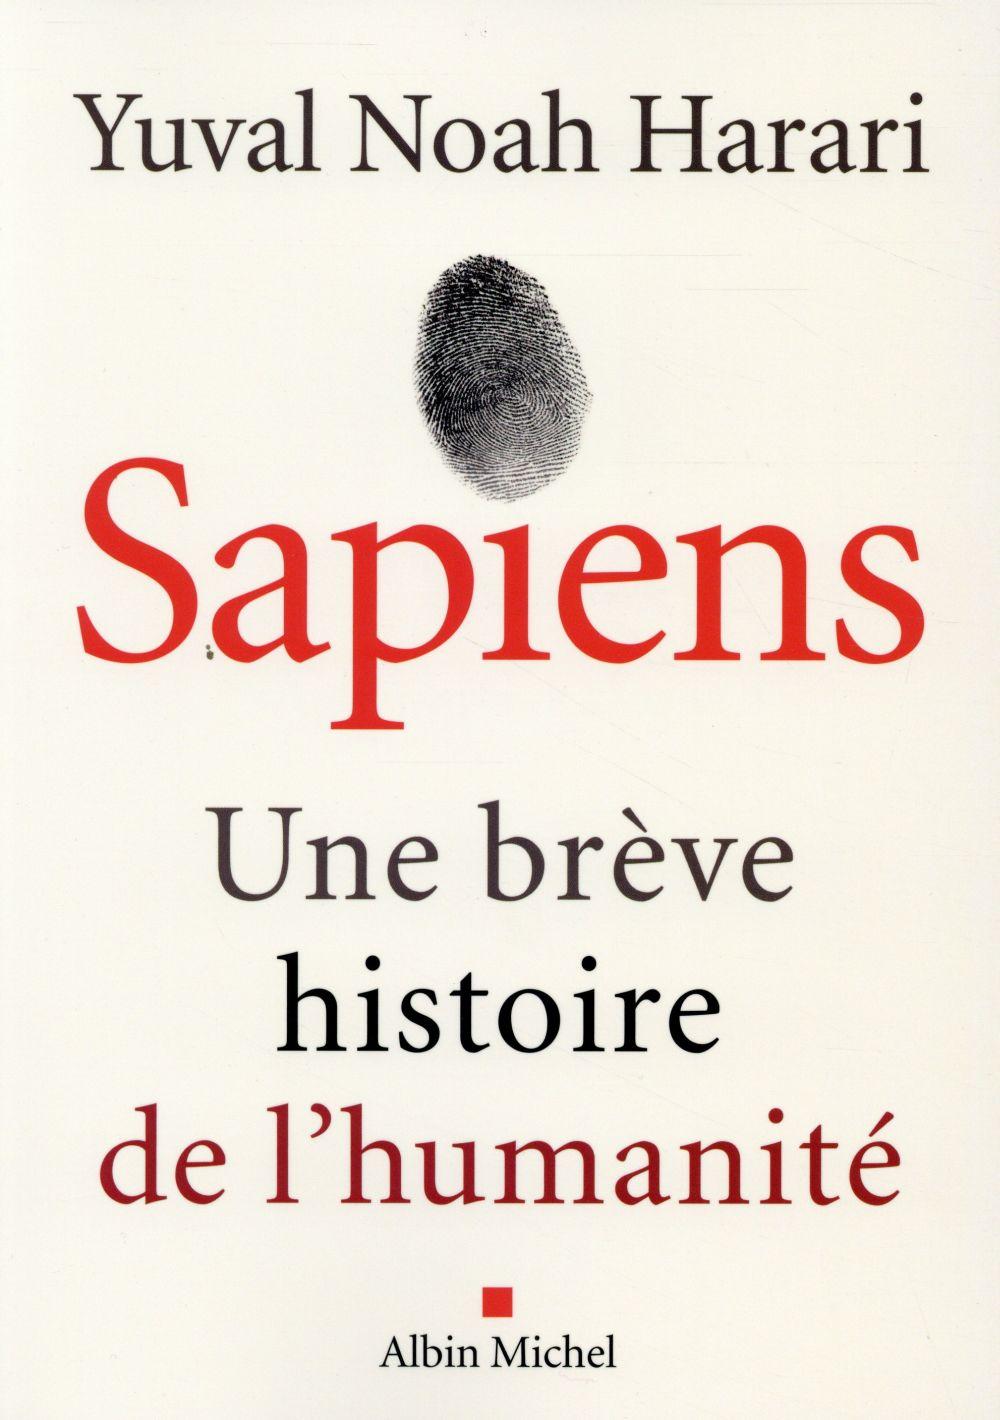 SAPIENS - UNE BREVE HISTOIRE D HARARI YUVAL NOAH ALBIN MICHEL